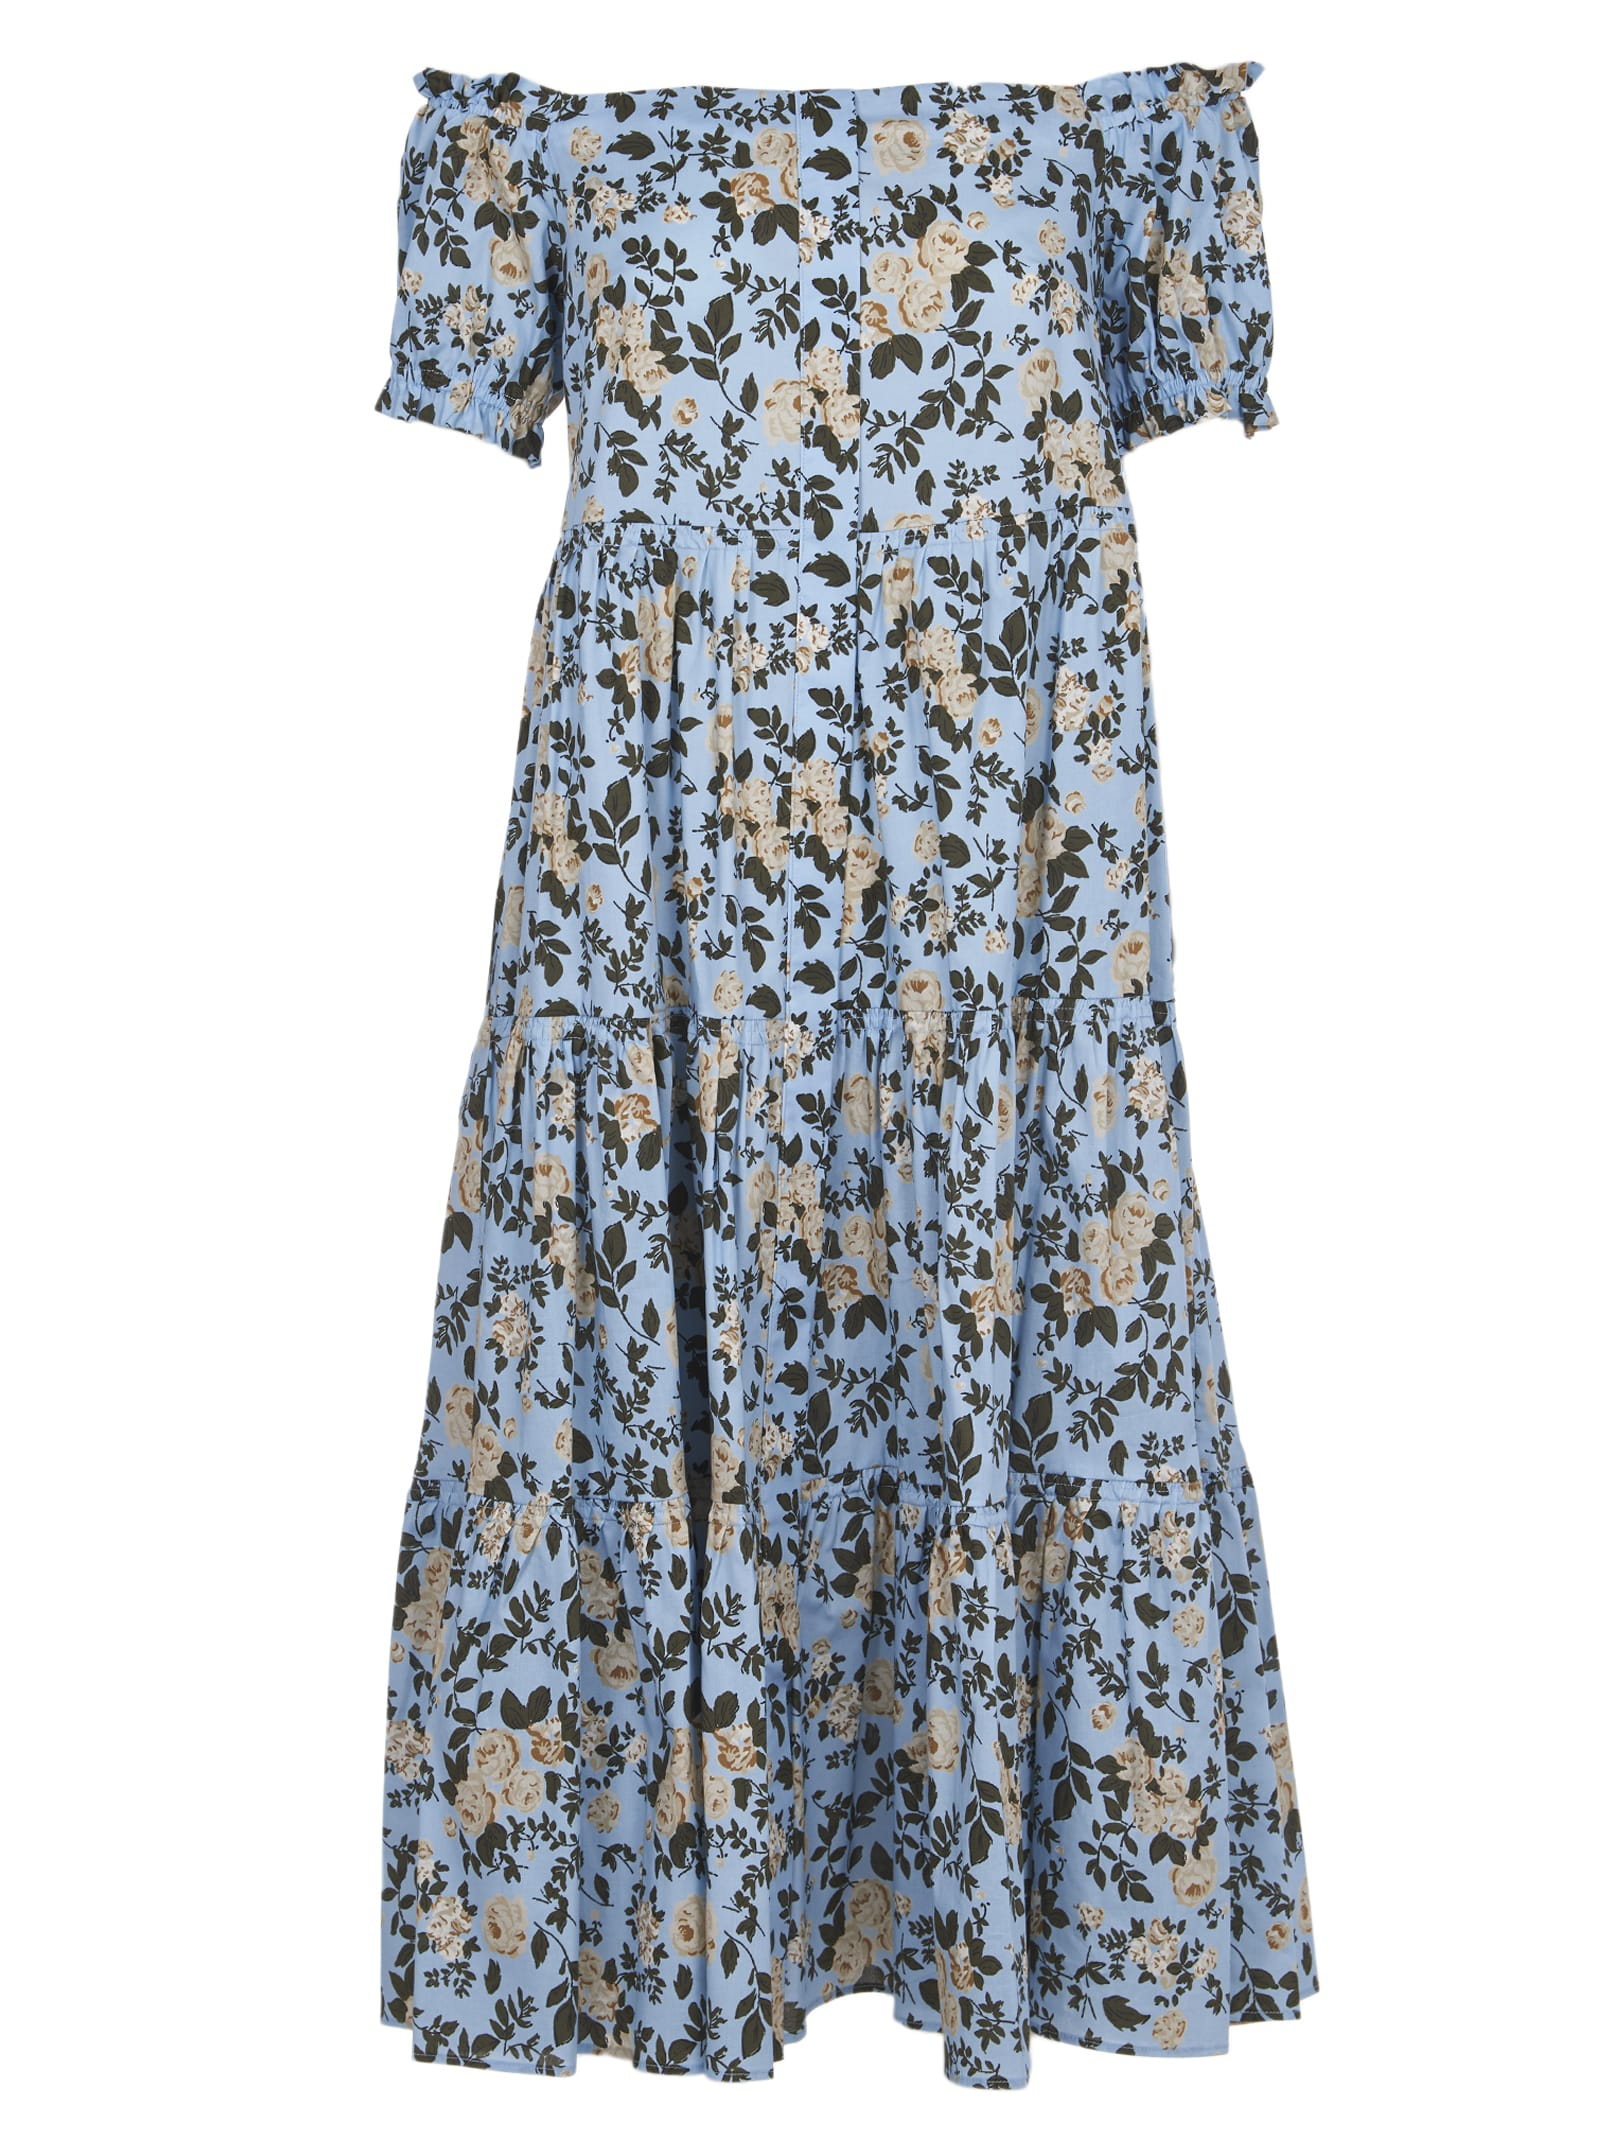 Semicouture Cottons LOGN BLUE FLORAL DRESS